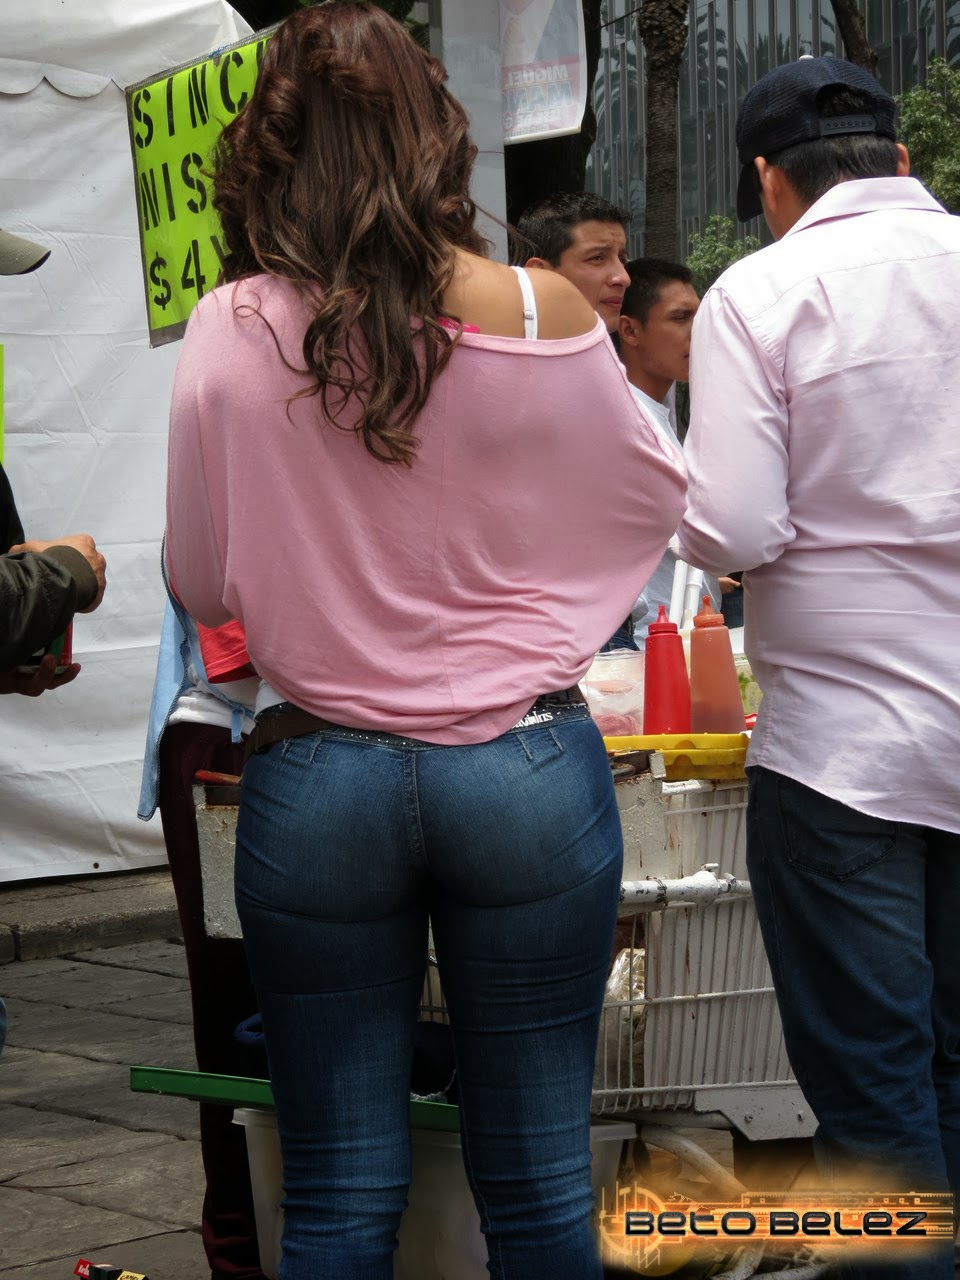 Espiada con licra jeans bien pegada a sus nalgas - 5 1